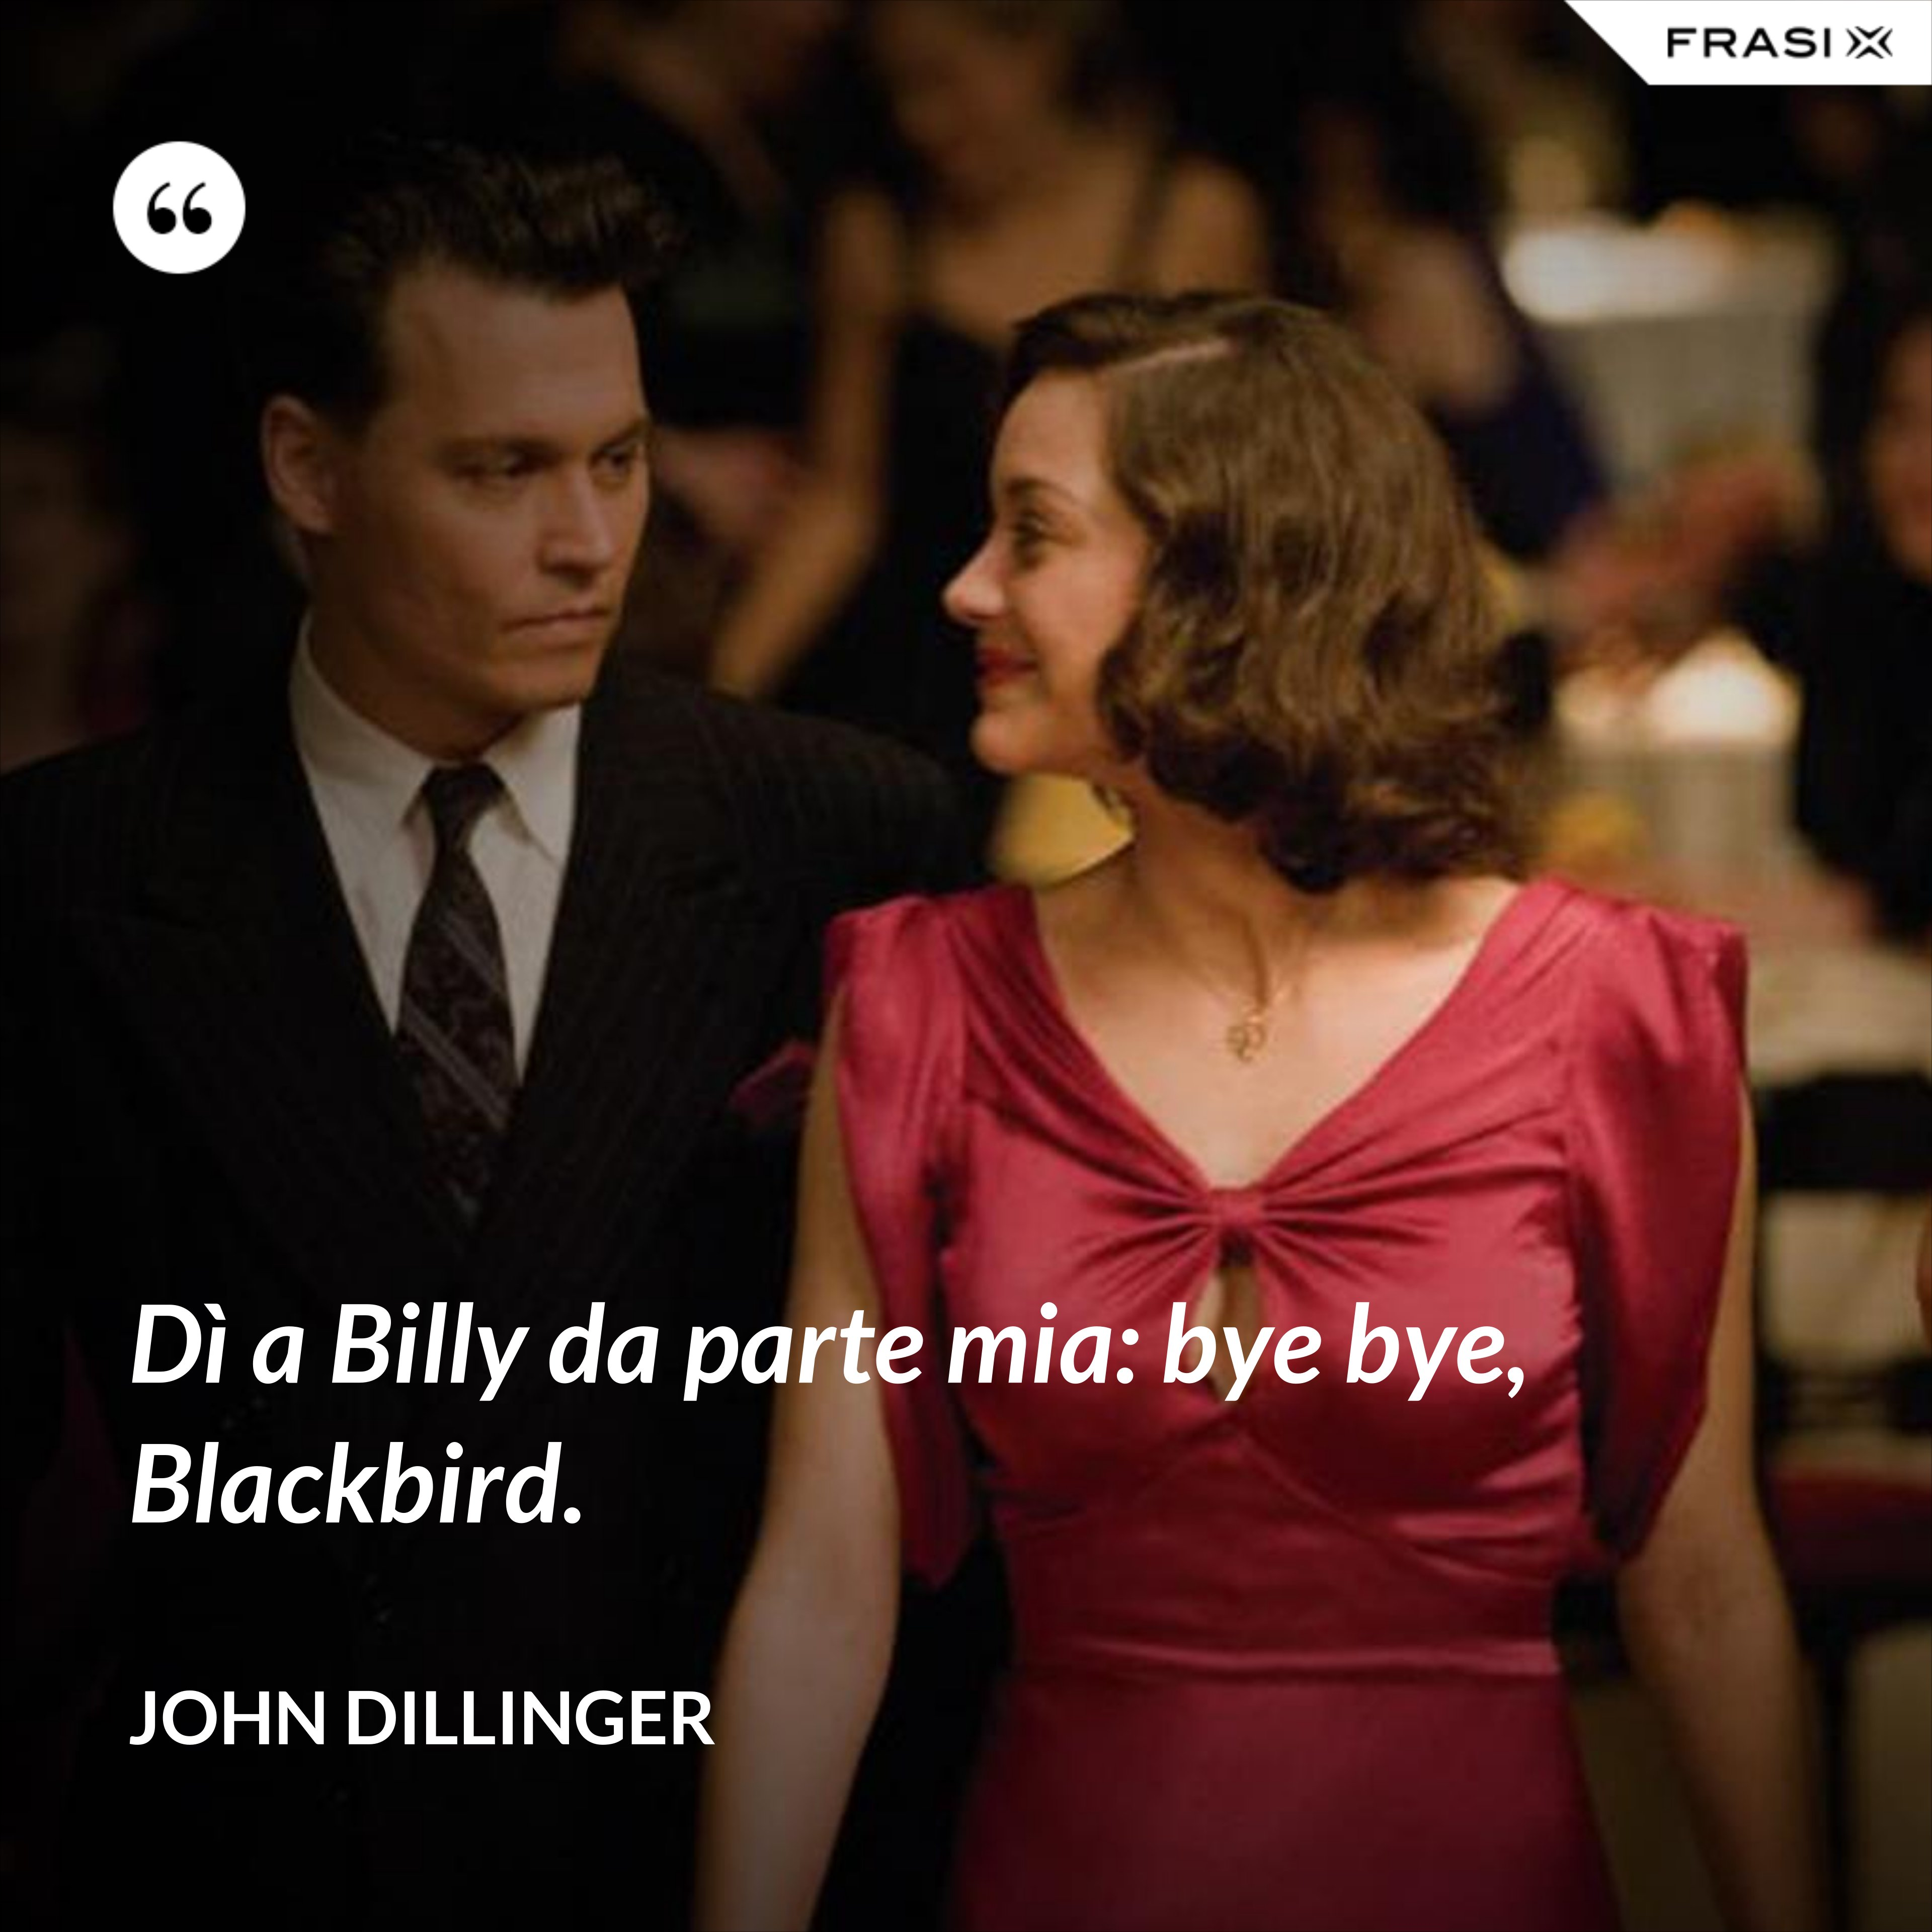 Dì a Billy da parte mia: bye bye, Blackbird. - John Dillinger